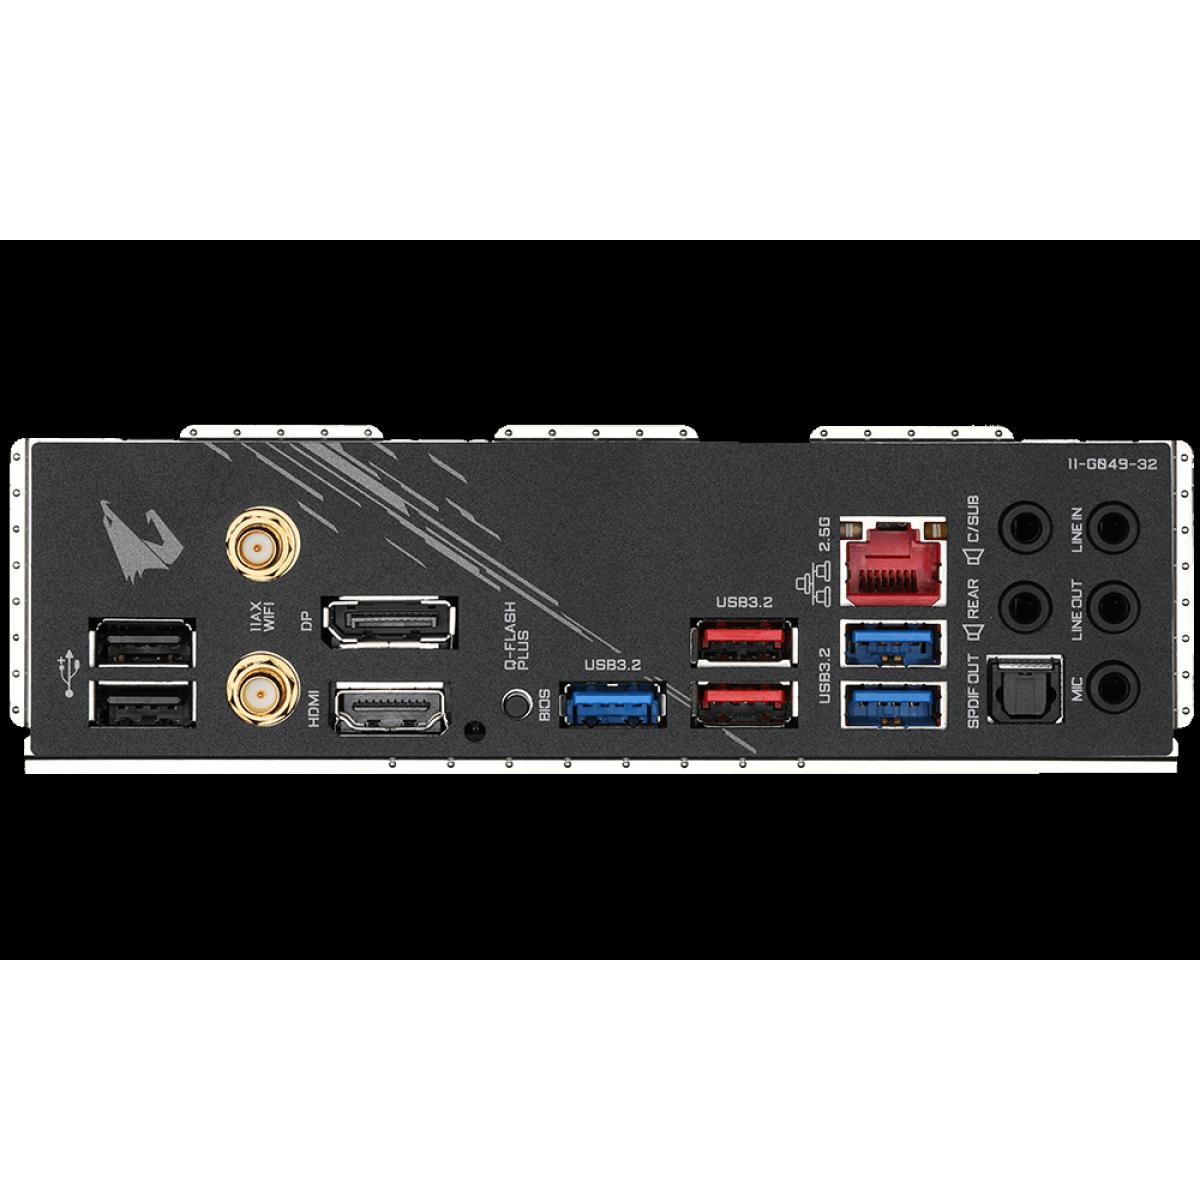 Placa Mãe Gigabyte B550 AORUS Elite AX V2, Chipset B550, AMD AM4, ATX, DDR4, 9MB55AEW2-00-10